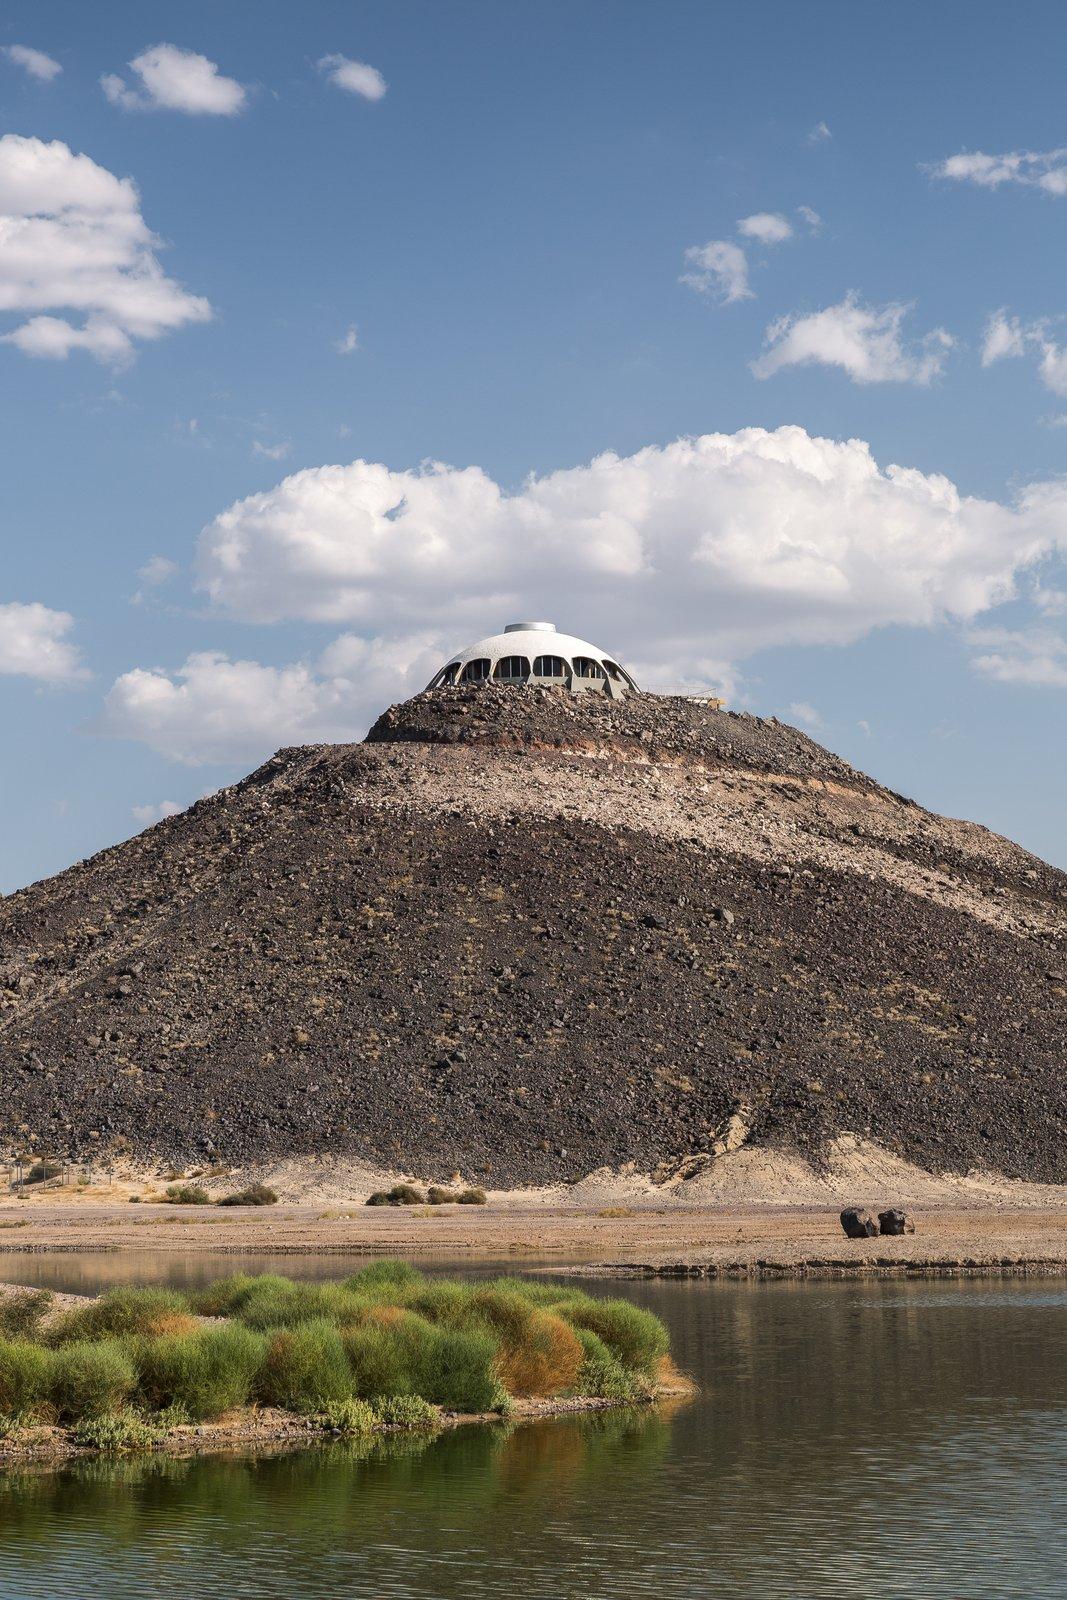 Outdoor, Desert, Boulders, and Shrubs  Volcano House by lance gerber